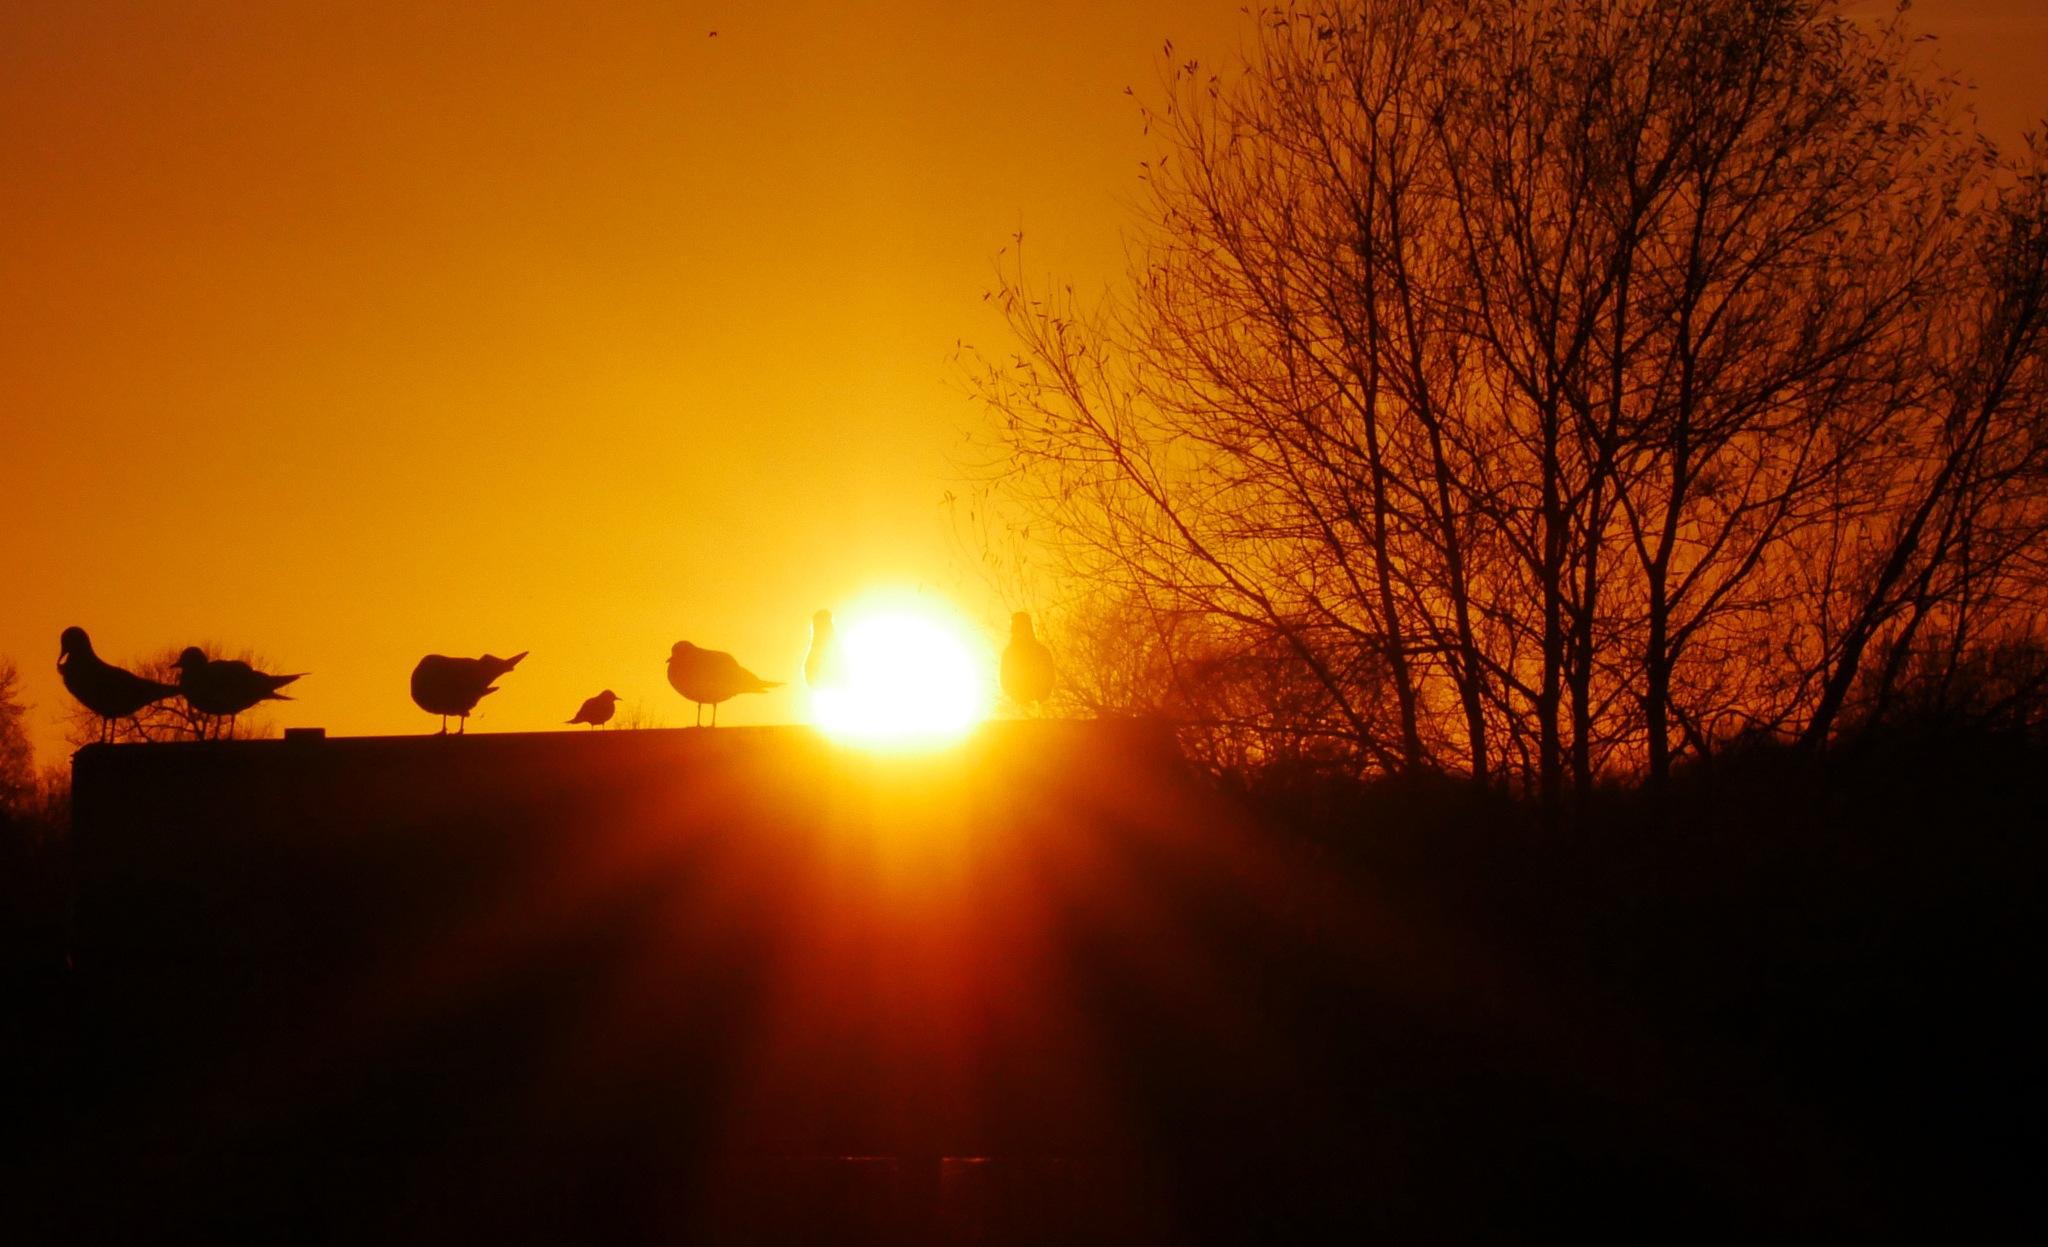 Seagull sunset by AJ Yakstrangler Andy Jamieson